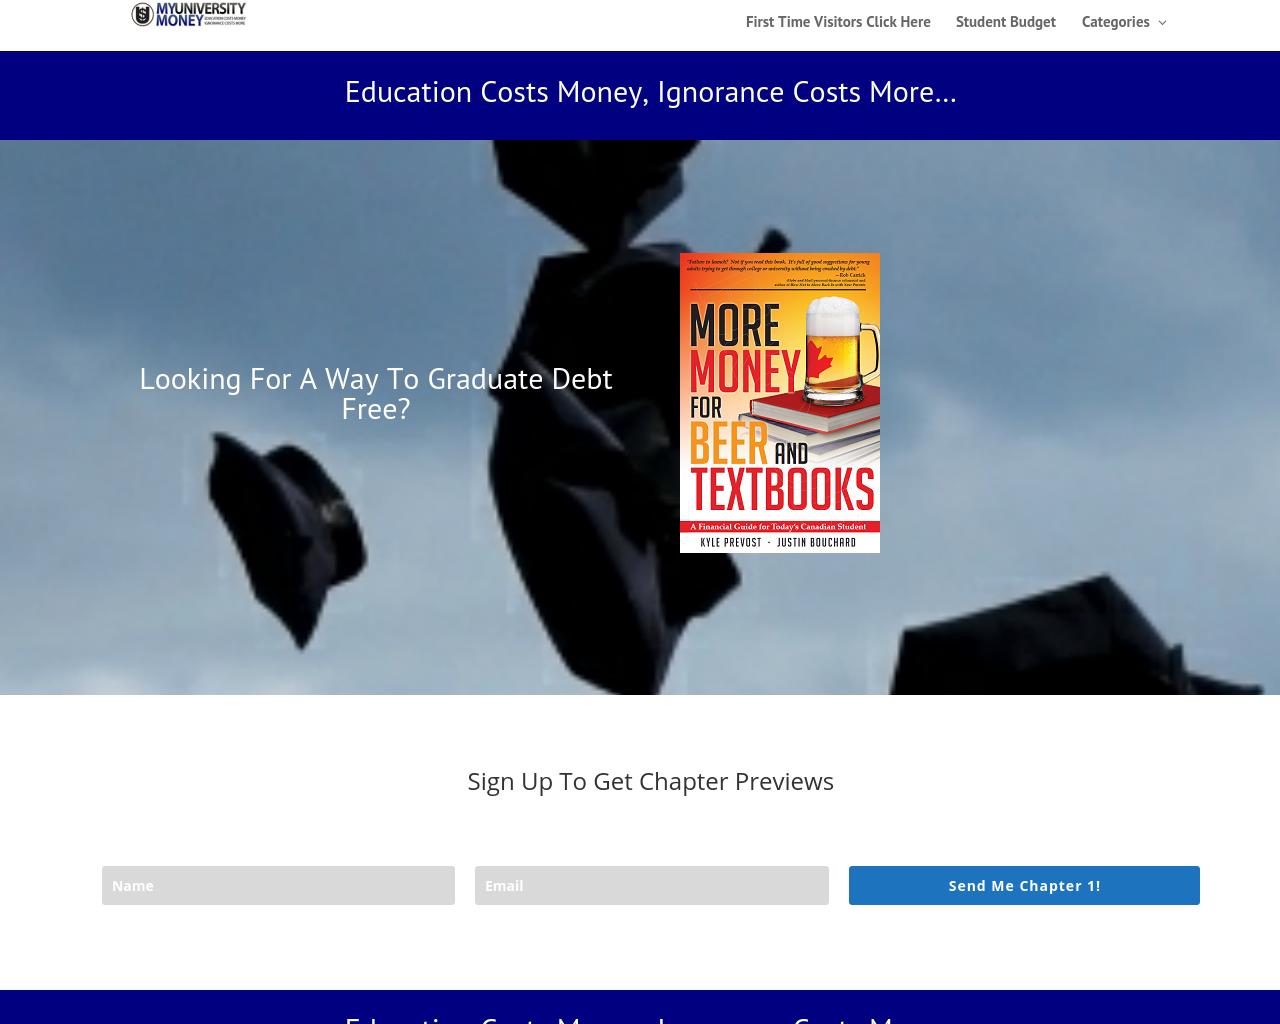 My-University-Money-Advertising-Reviews-Pricing